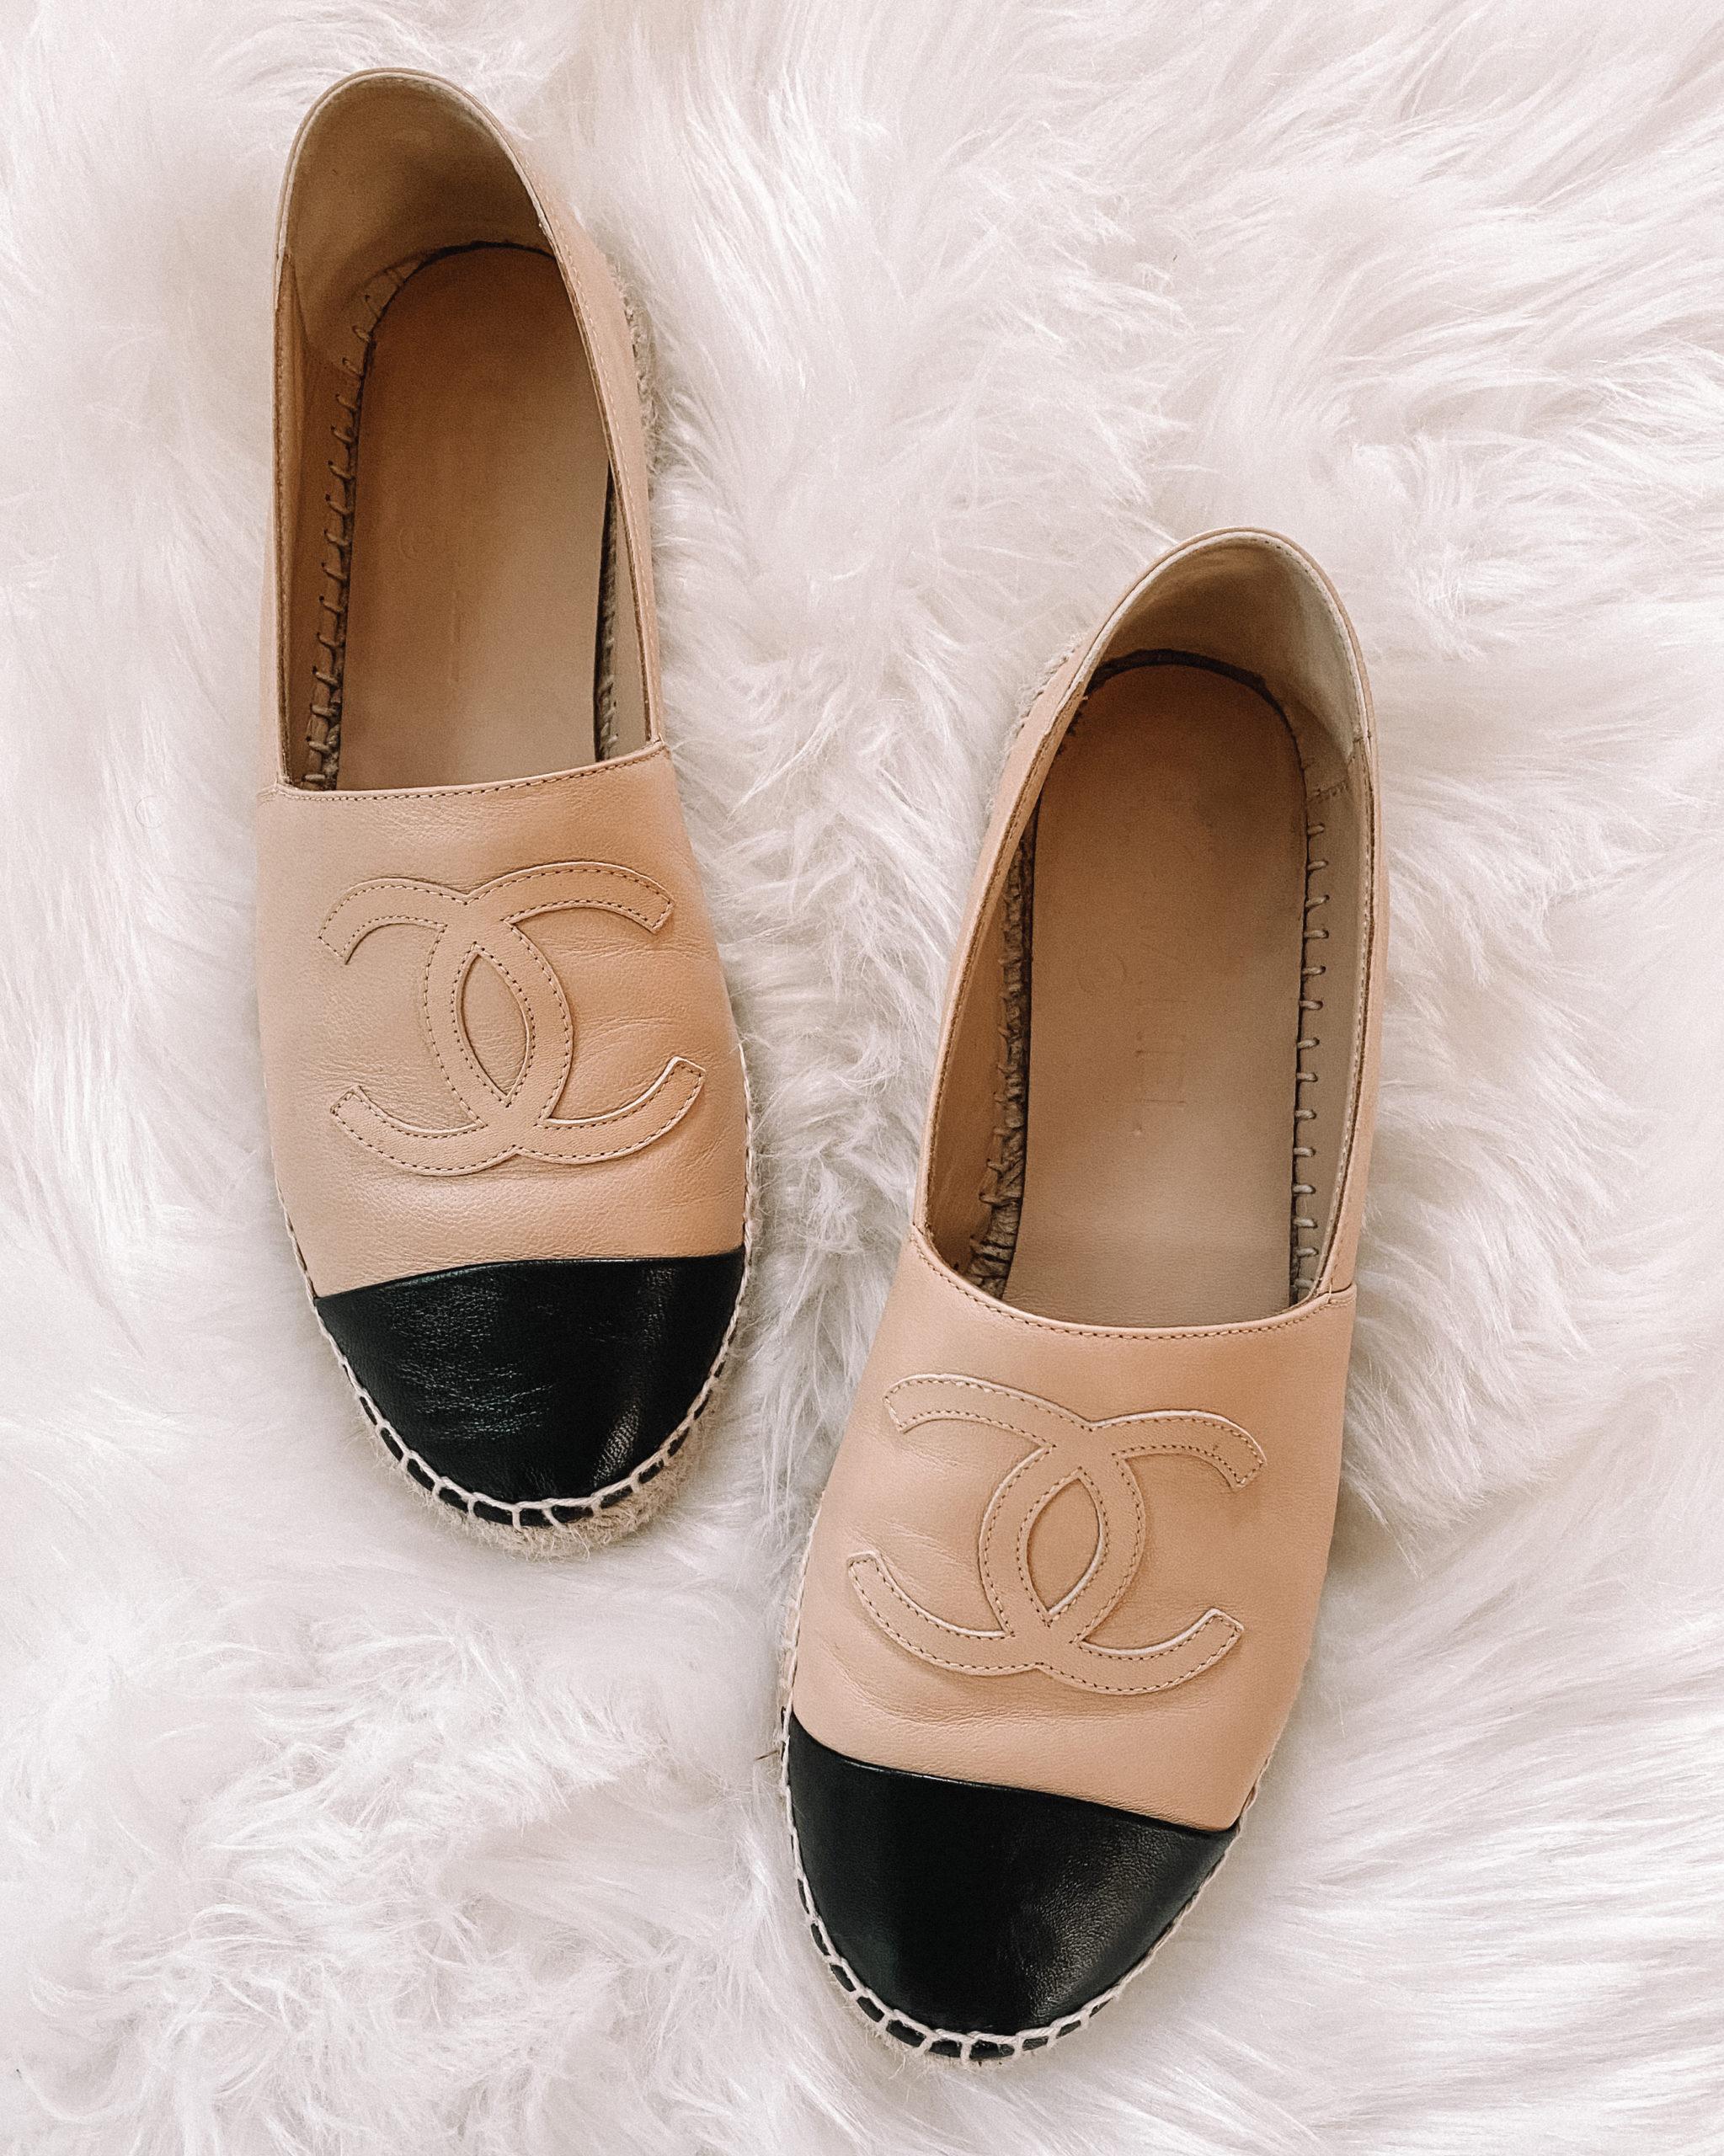 Fashion Jackson Chanel Espadrilles